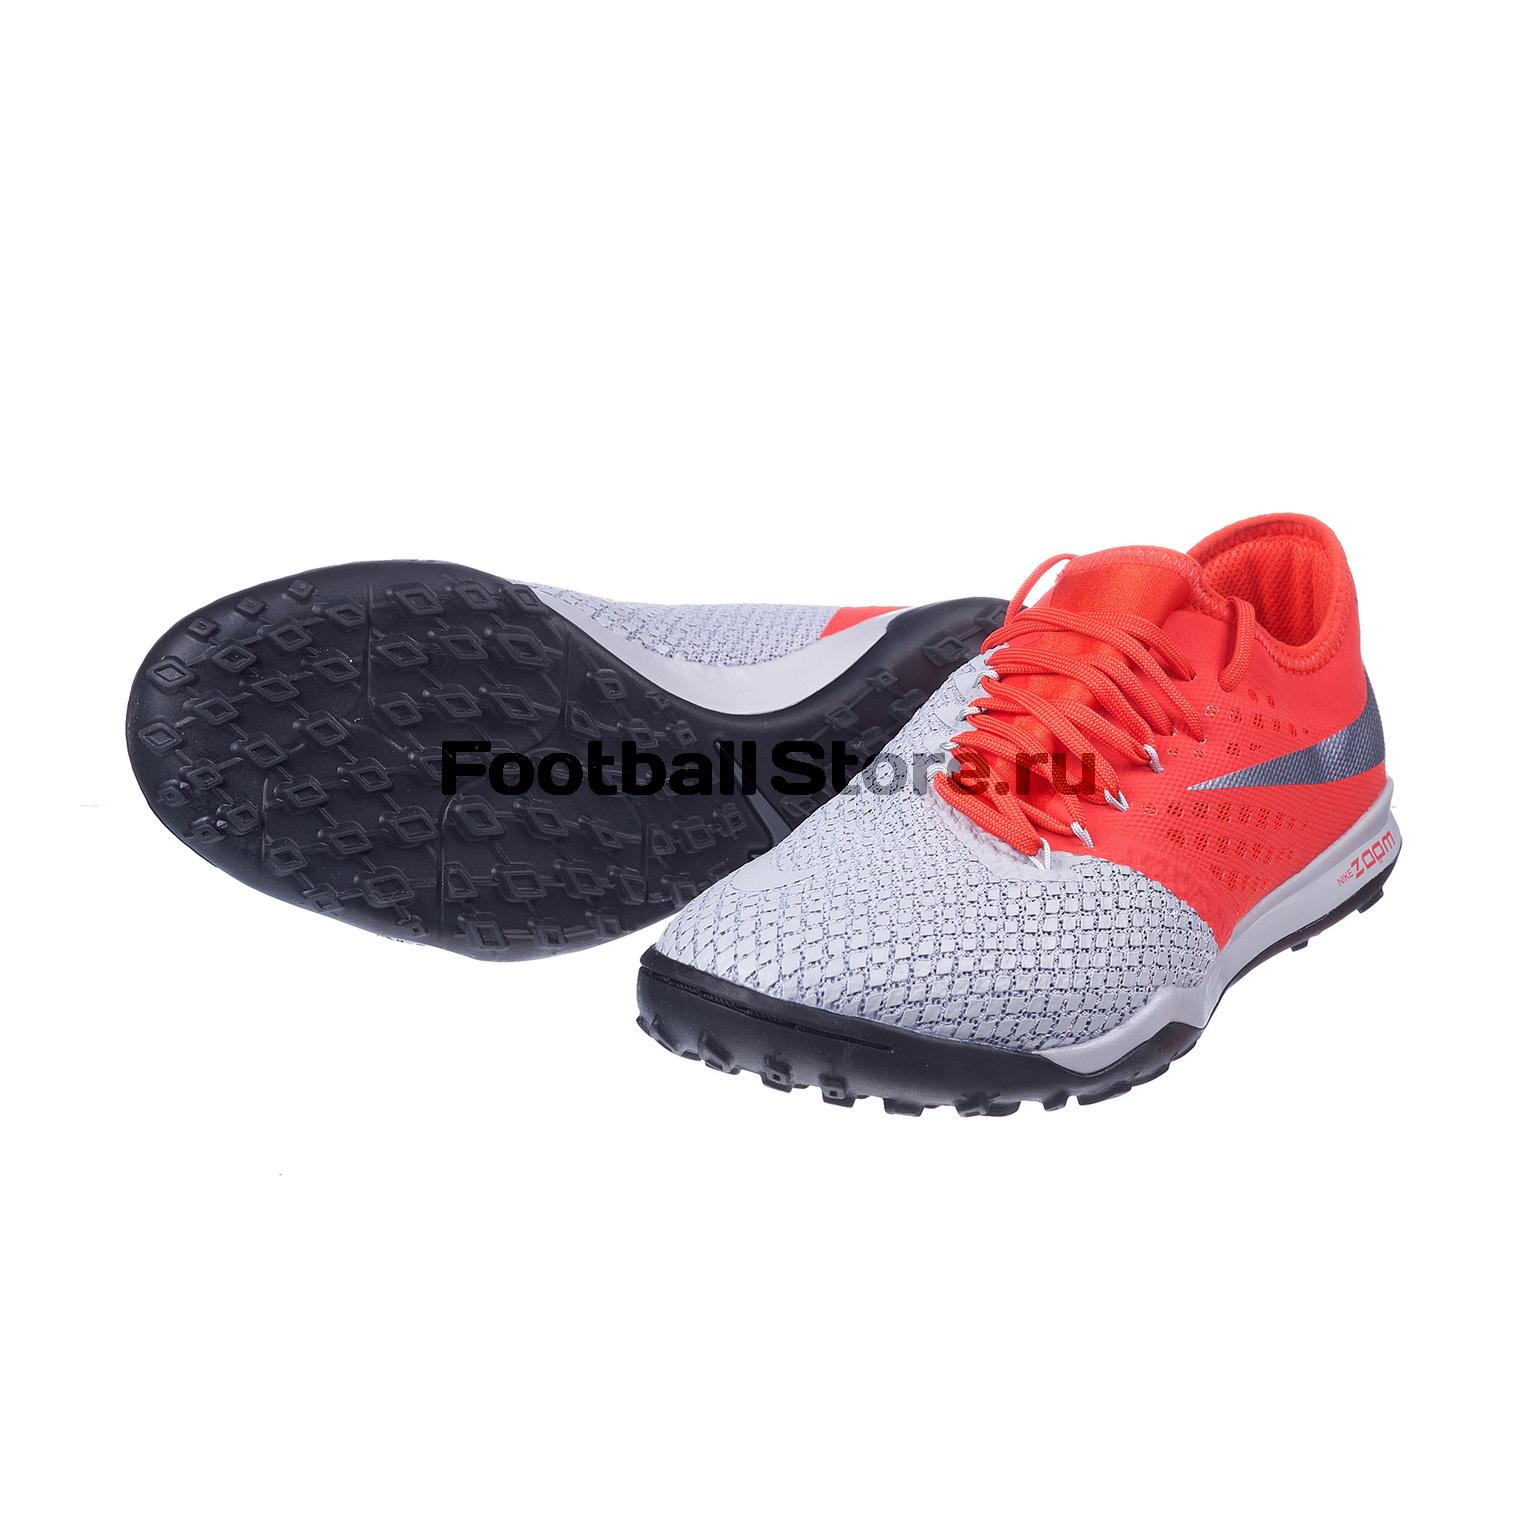 Шиповки Nike Zoom Hypervenom 3 Pro TF AJ3817-060 шиповки nike lunar legendx 7 pro tf ah7249 080